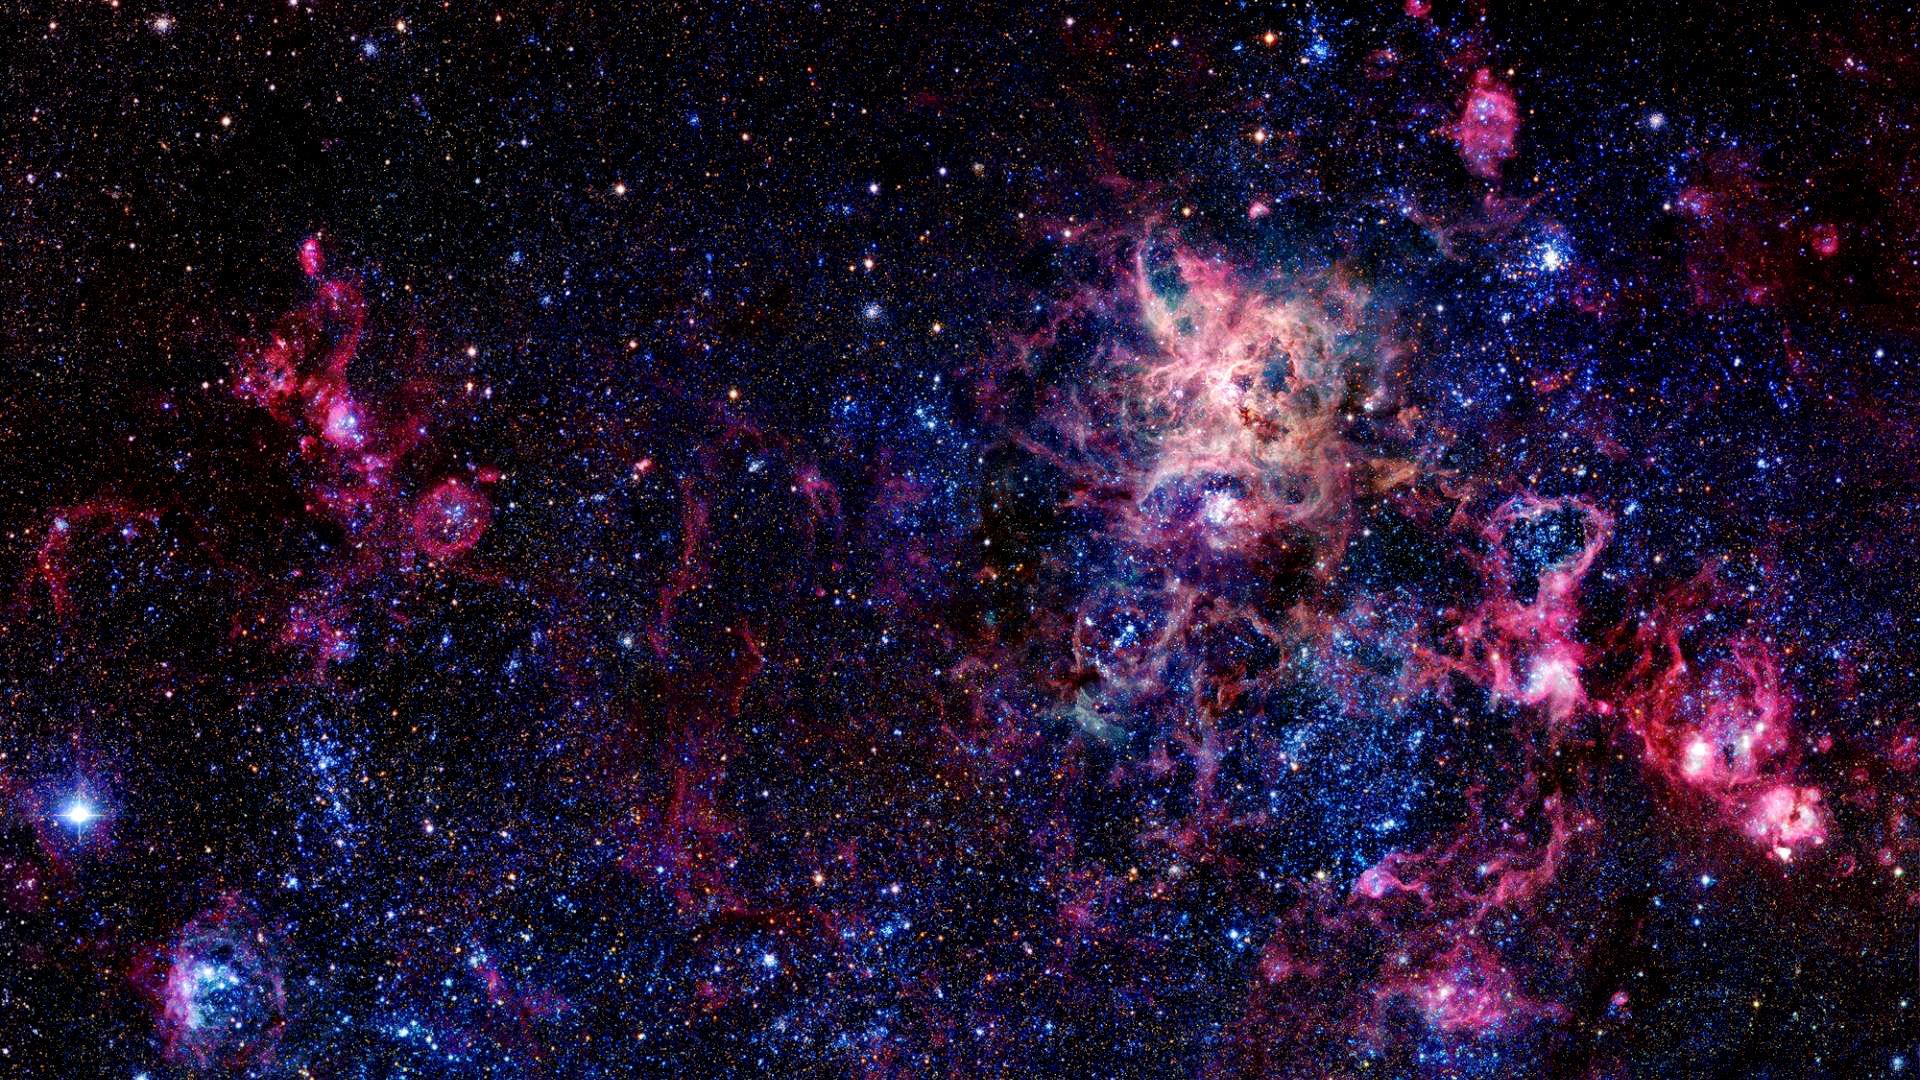 Nebula Backgrounds page 2   Pics about space 1920x1080